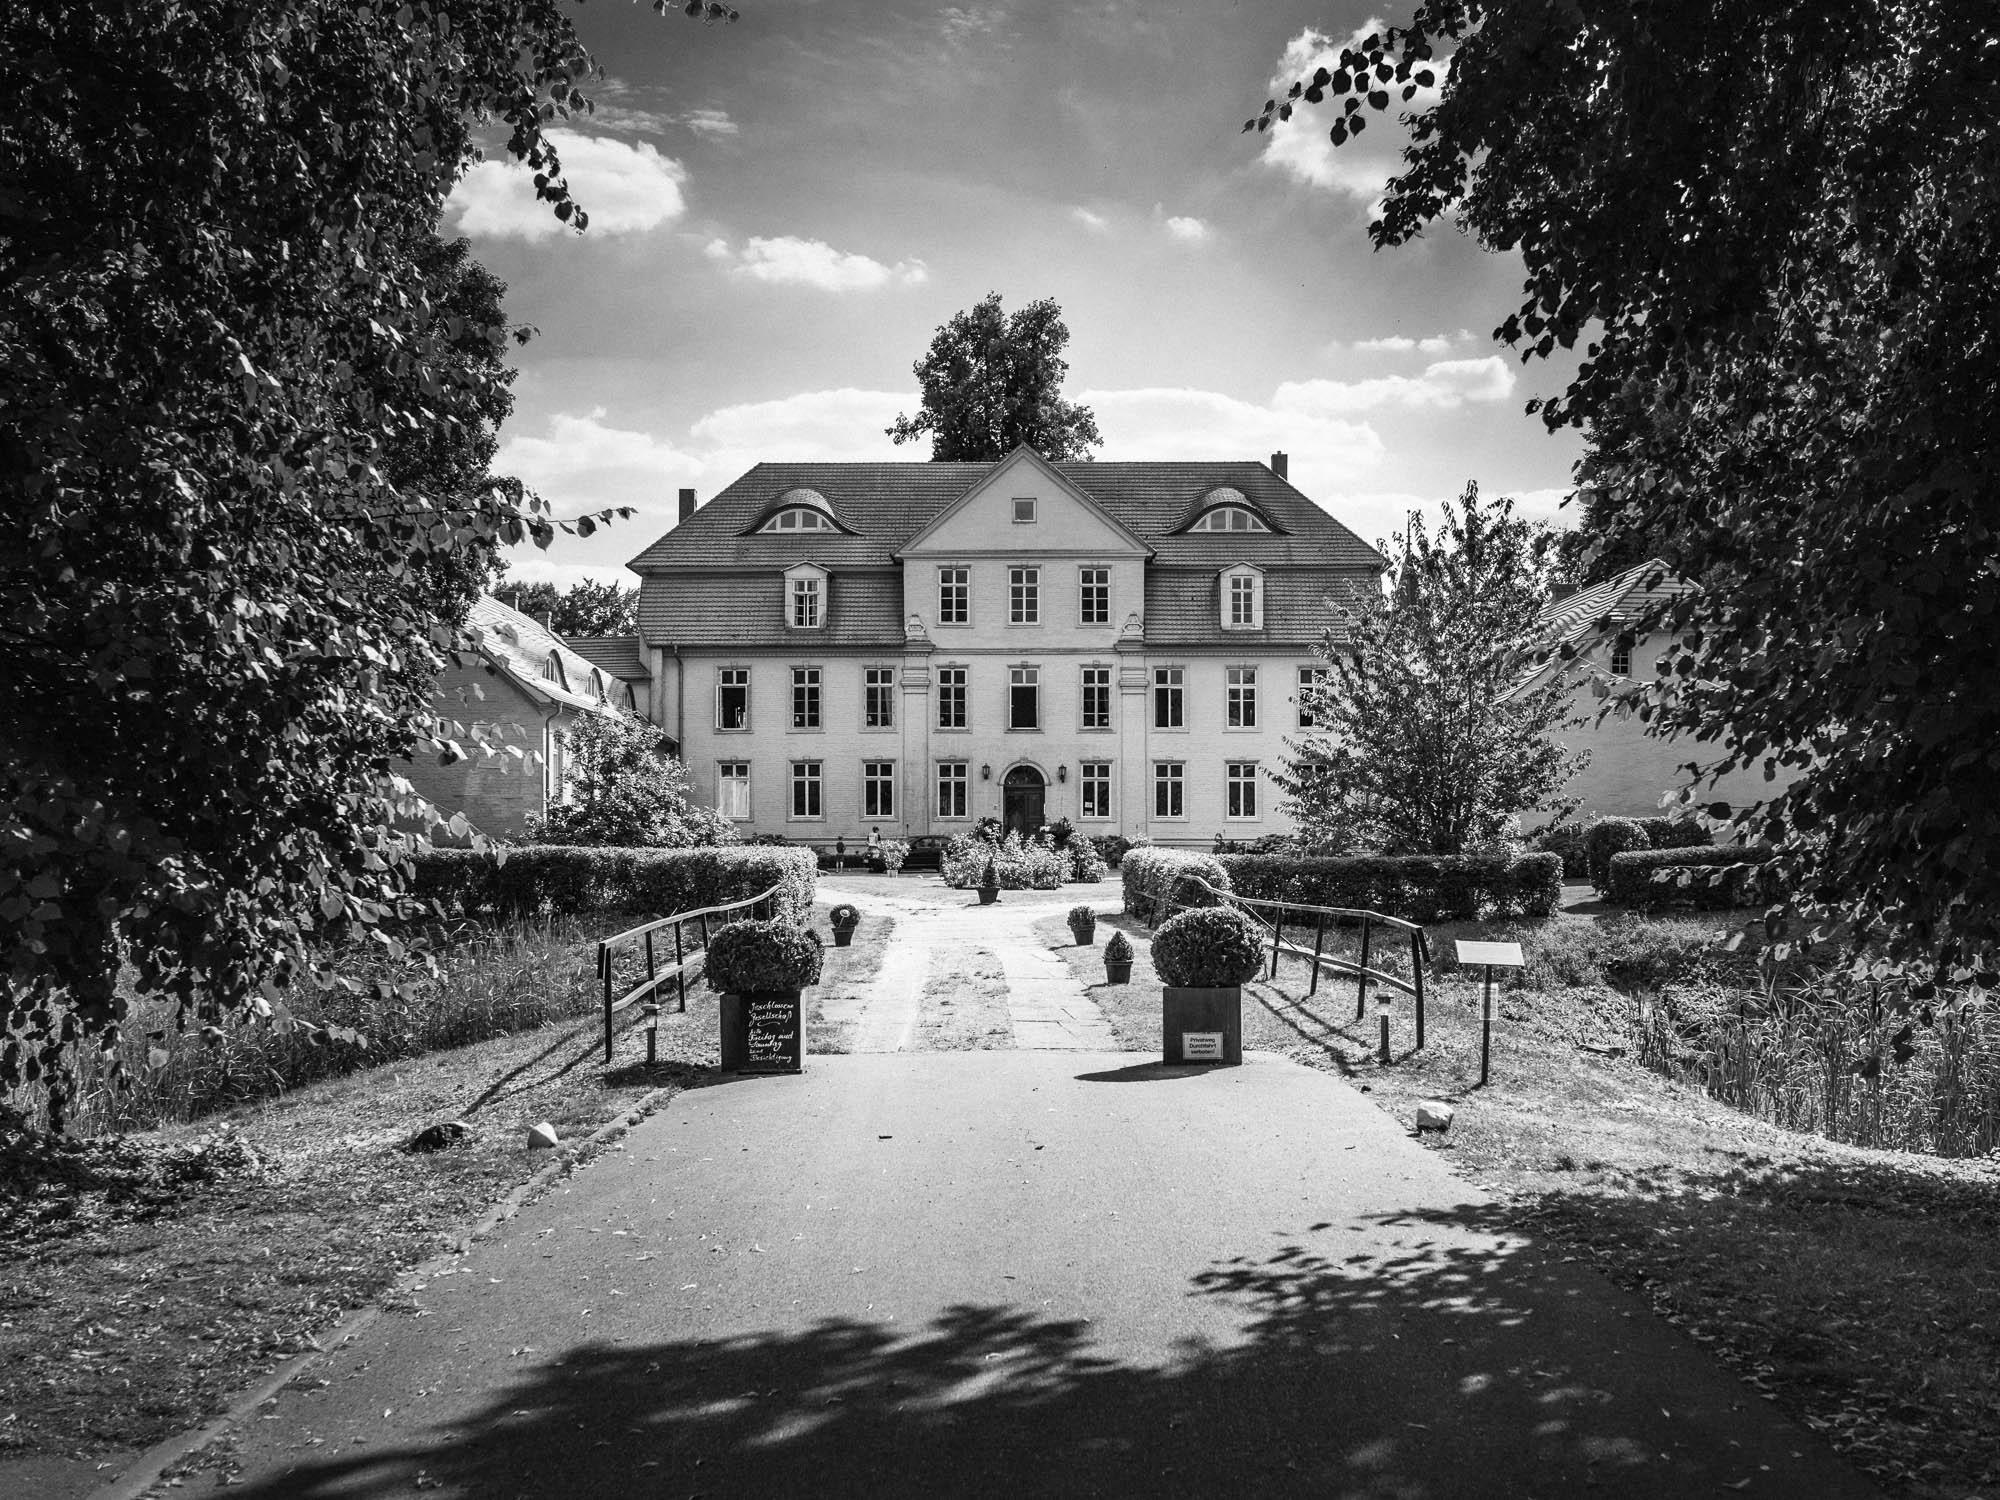 0002-Hochzeitsfotograf-Schloss-Lühburg.jpg